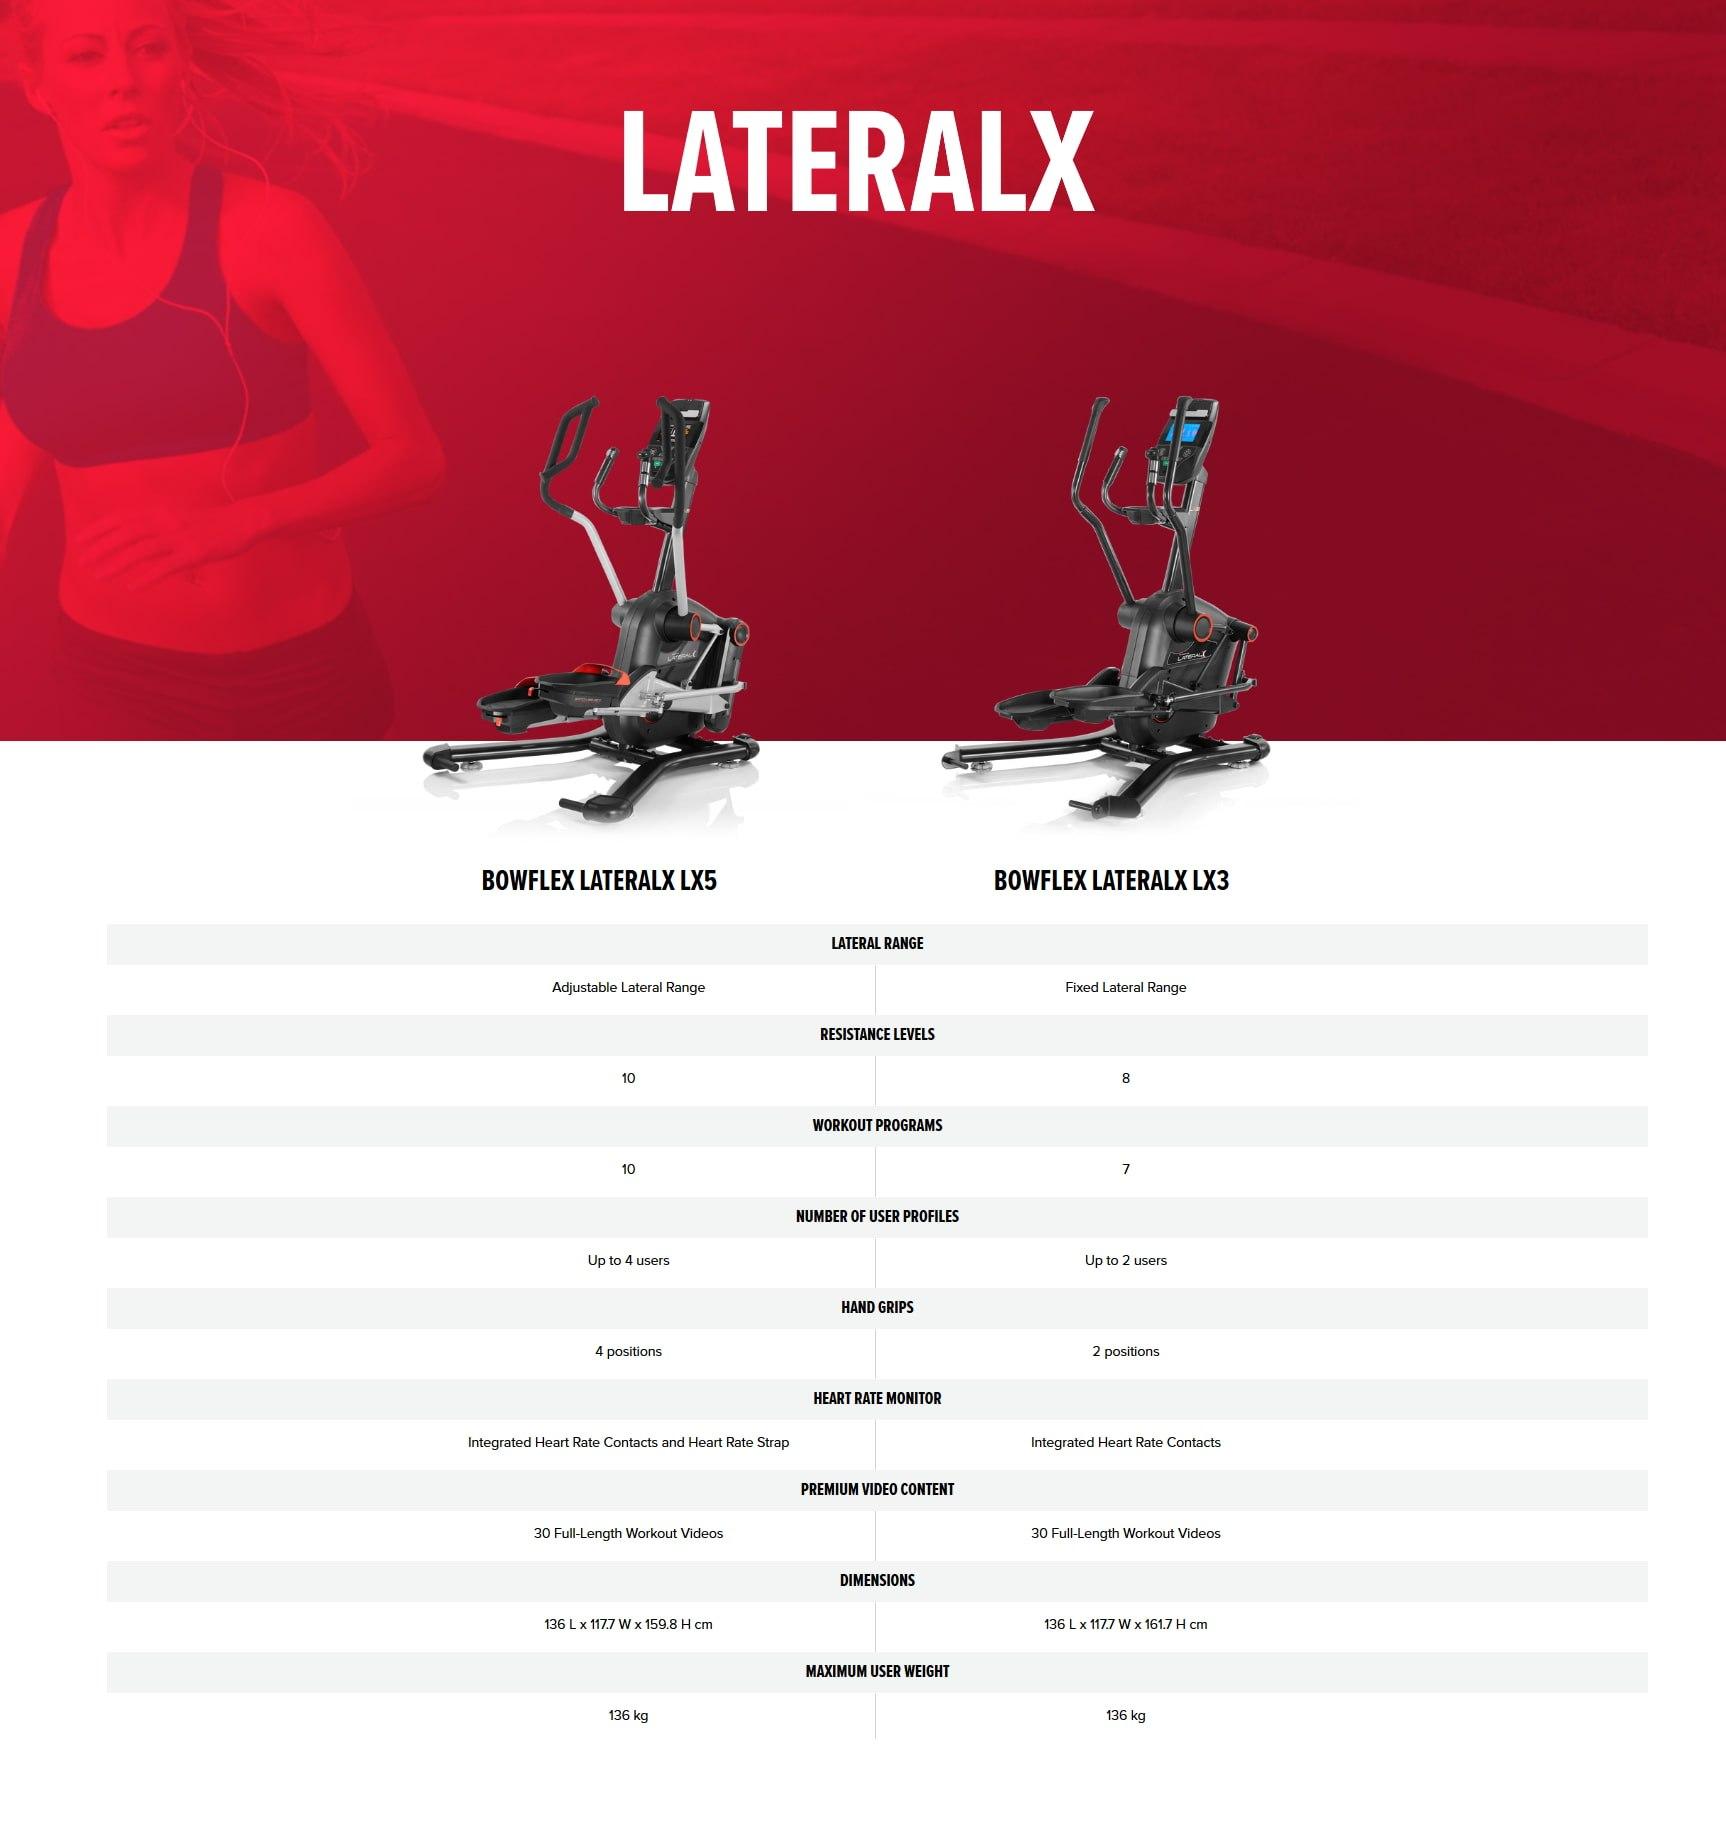 lateralx-min.jpg